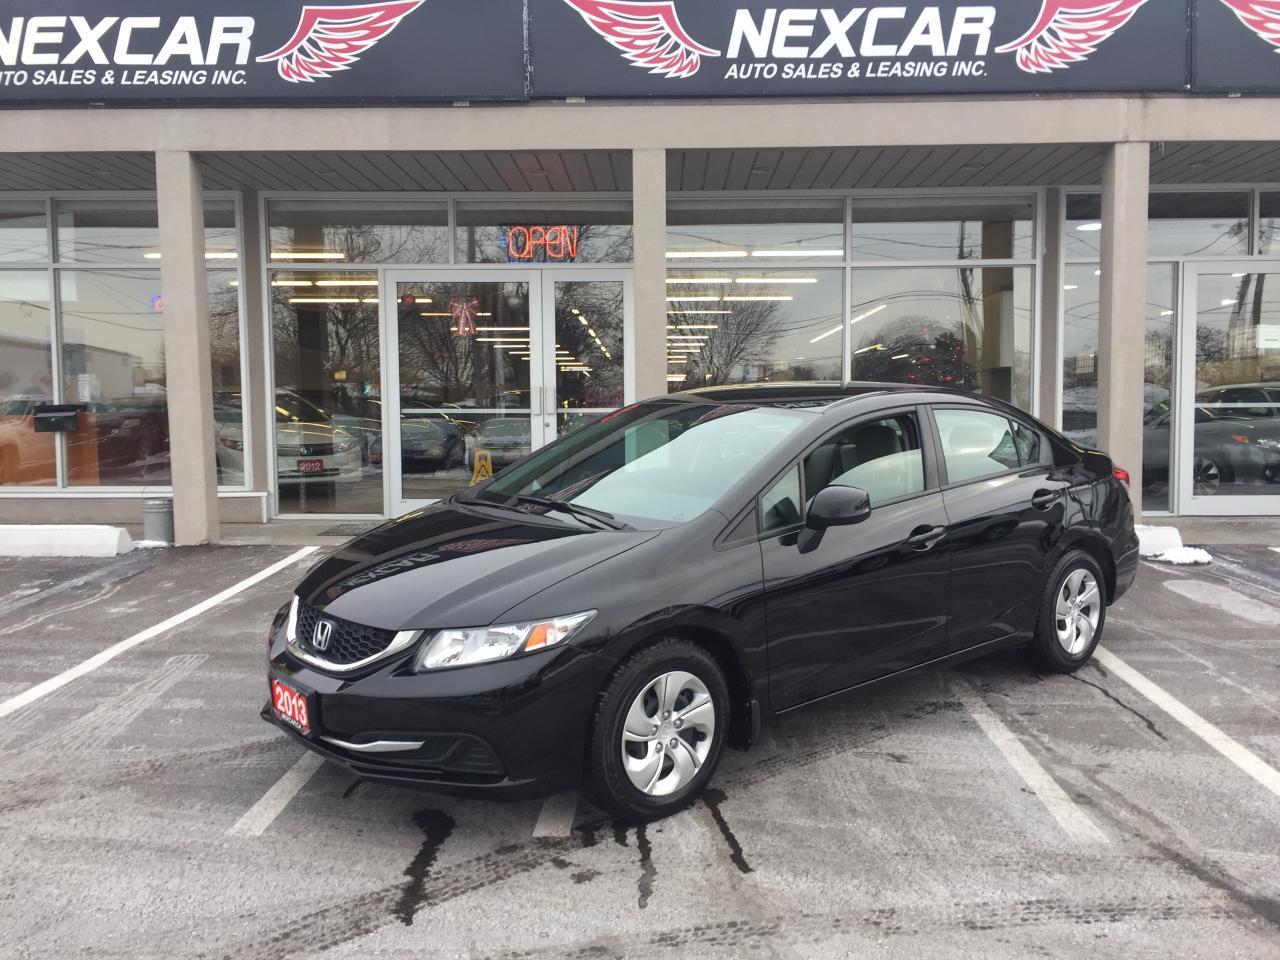 Photo of Black 2013 Honda Civic